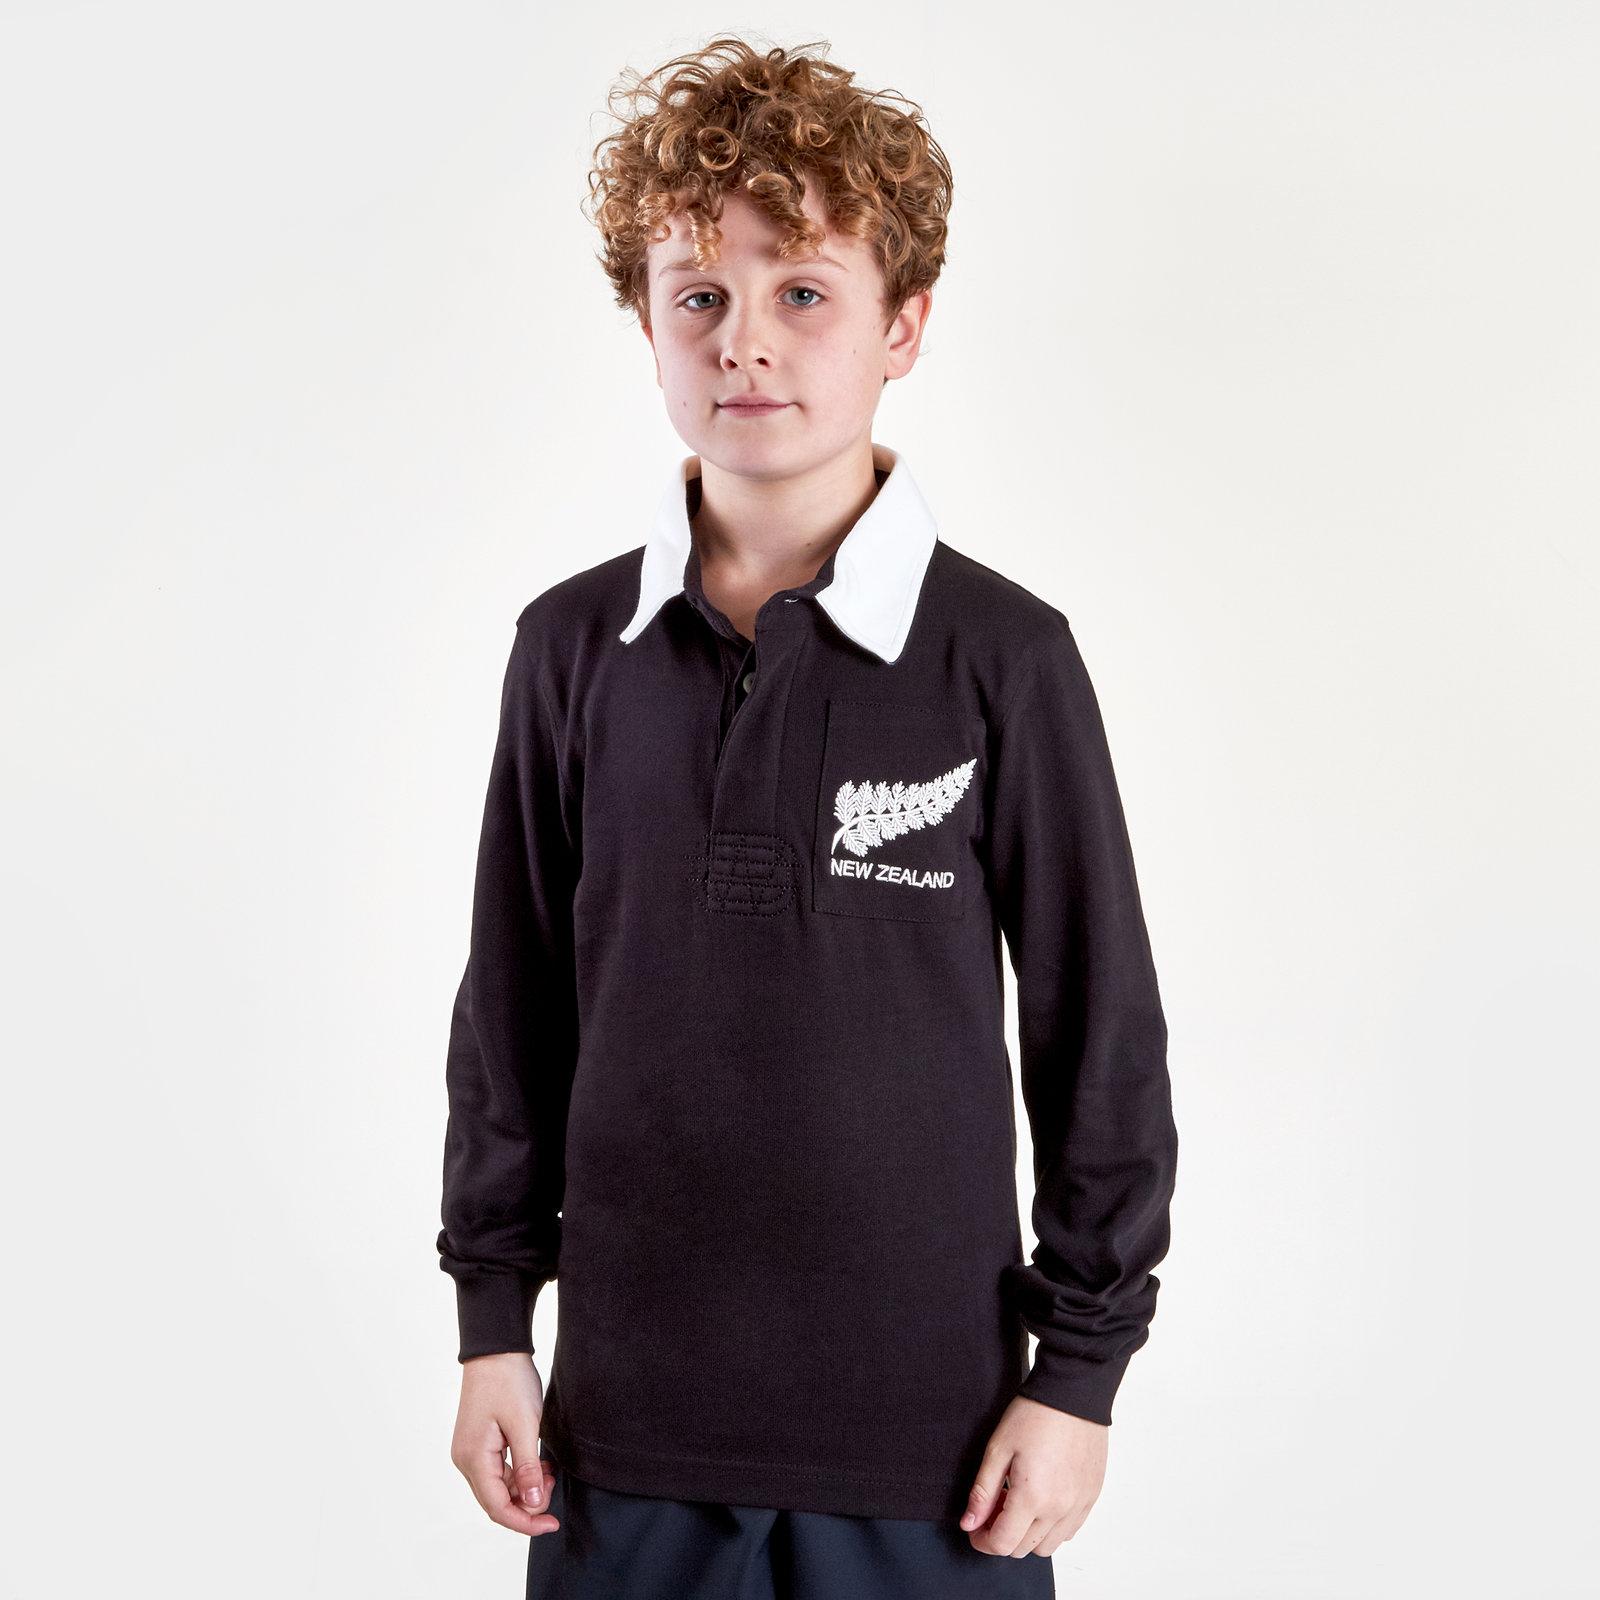 Retro New Zealand Shirt